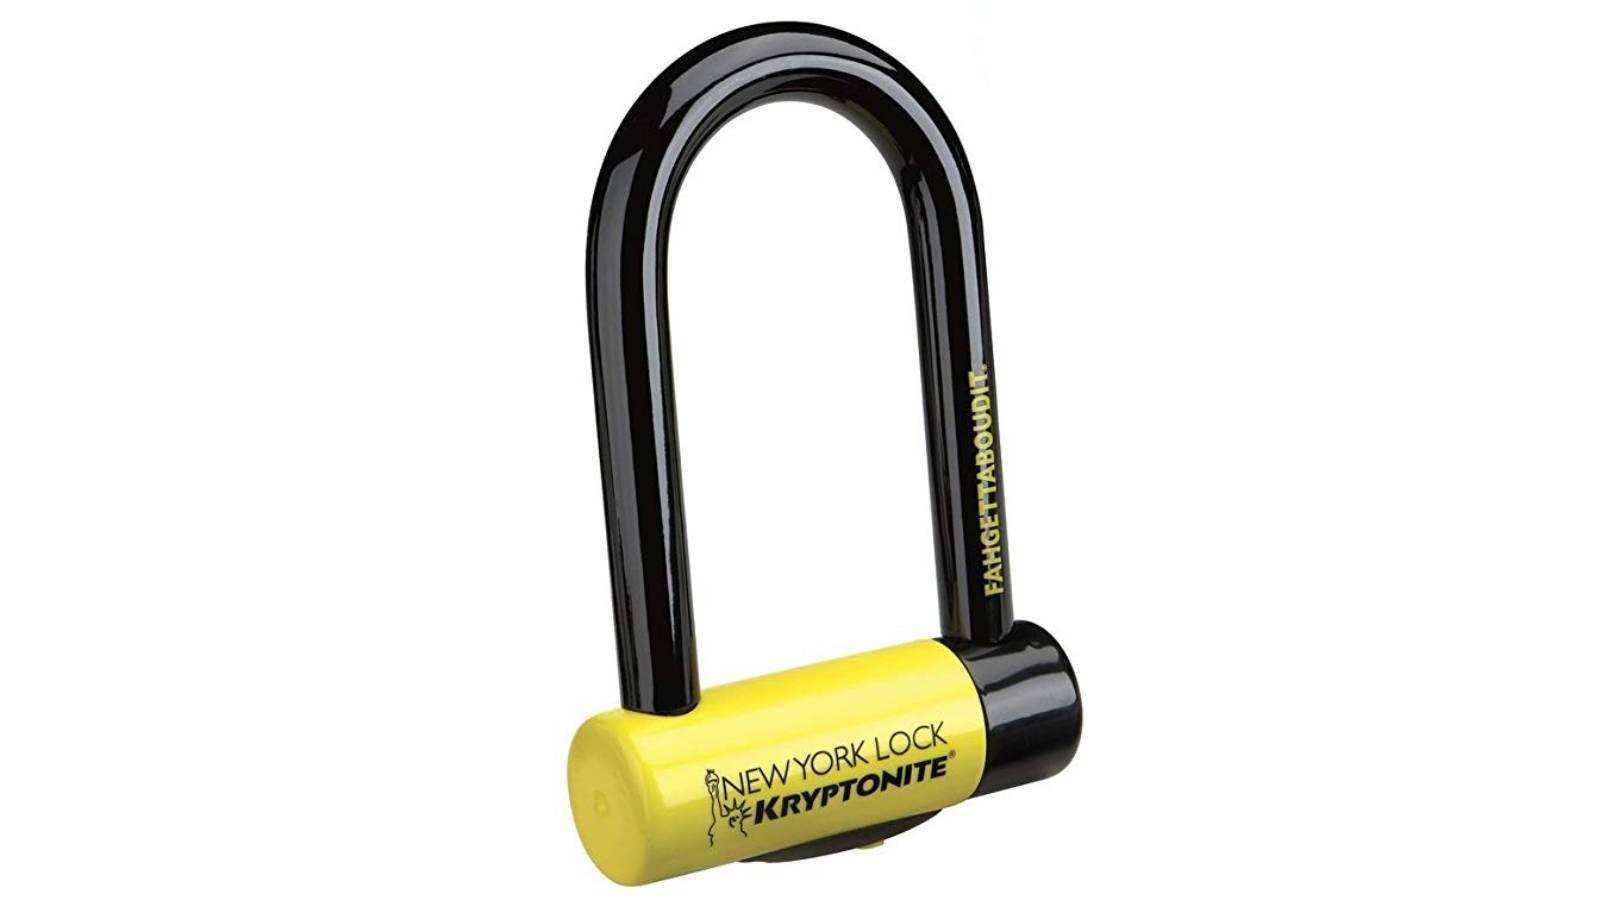 The Kryptonite New York Lock Fahgettaboutit Mini 18mm U-Lock Bicycle Lock.